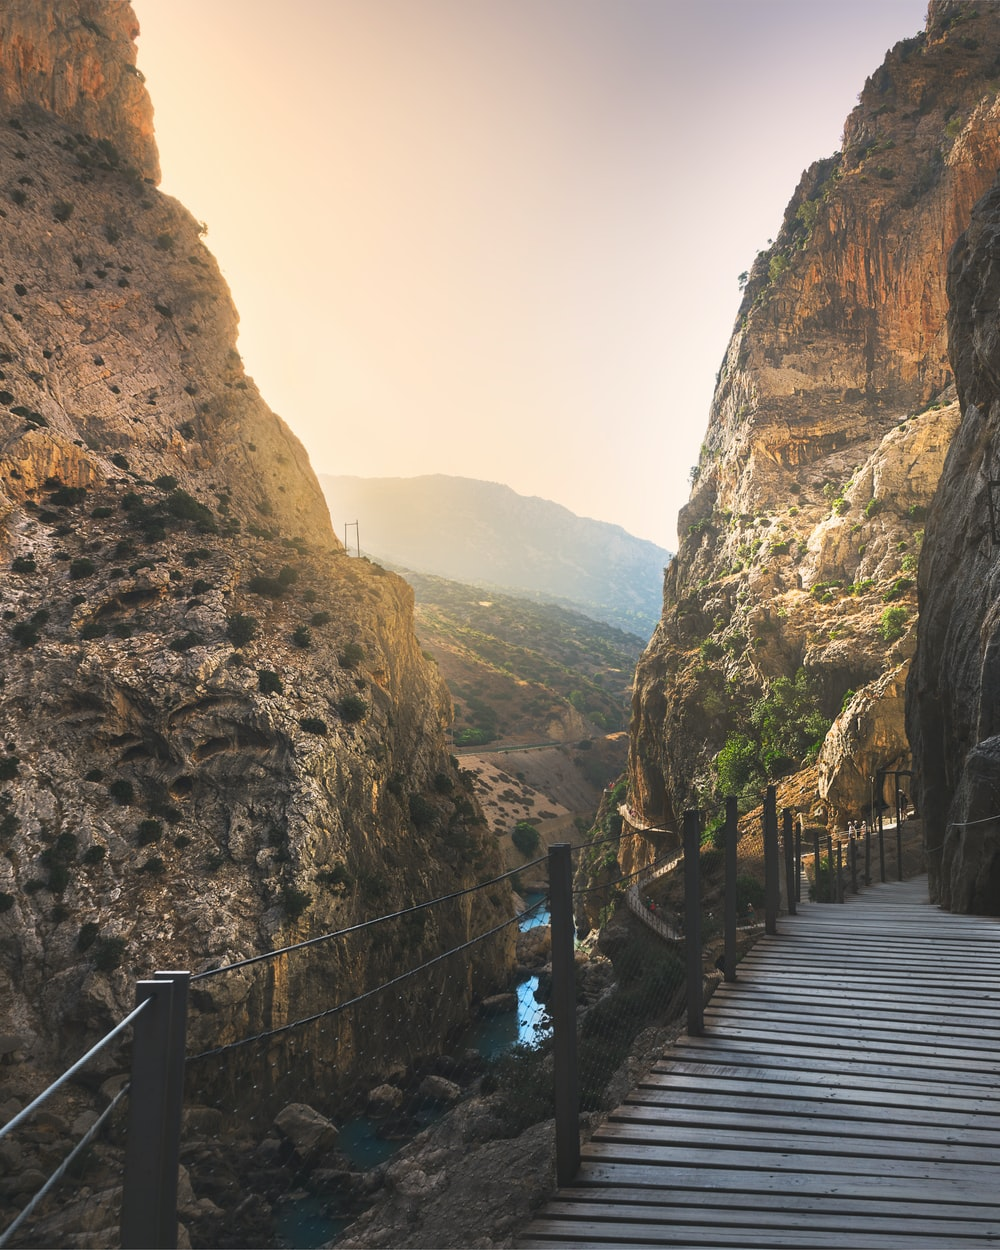 brown wooden bridge between brown rocky mountains during daytime